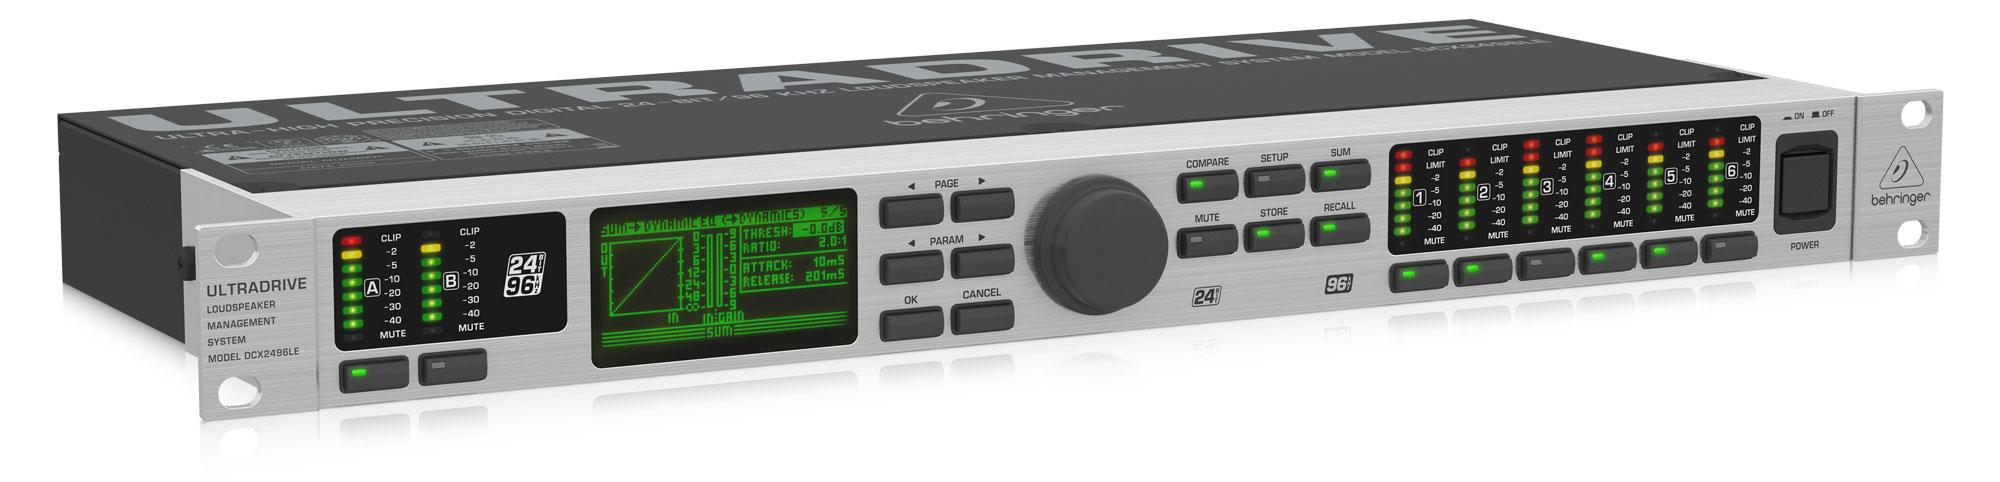 Studioeffekte - Behringer DCX2496LE Ultradrive - Onlineshop Musikhaus Kirstein